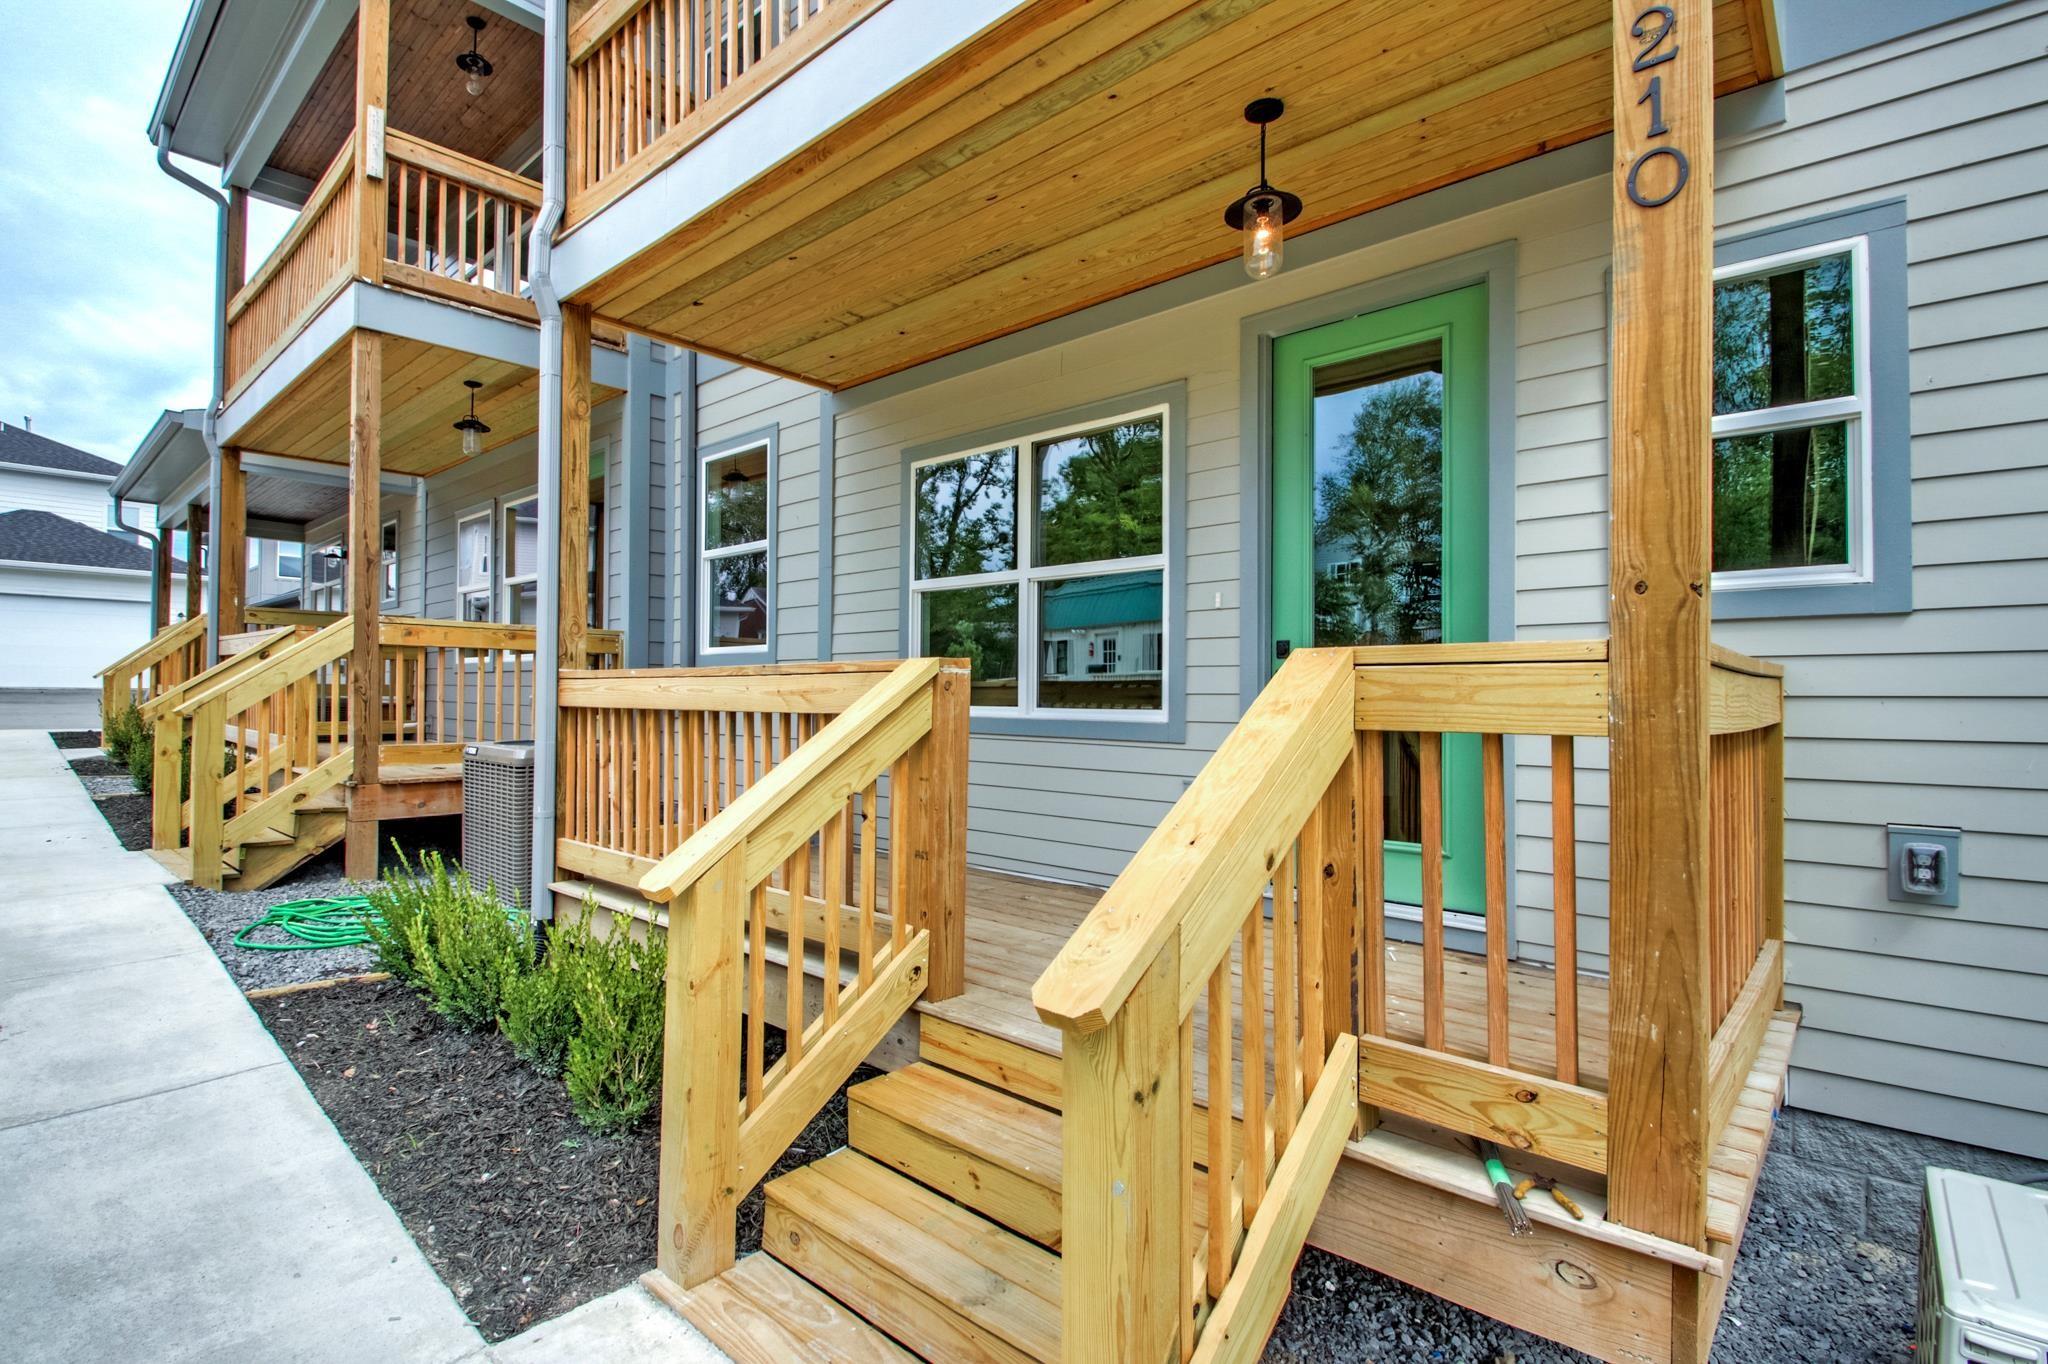 230 Croleywood Ln, Nashville, TN 37209 - Nashville, TN real estate listing